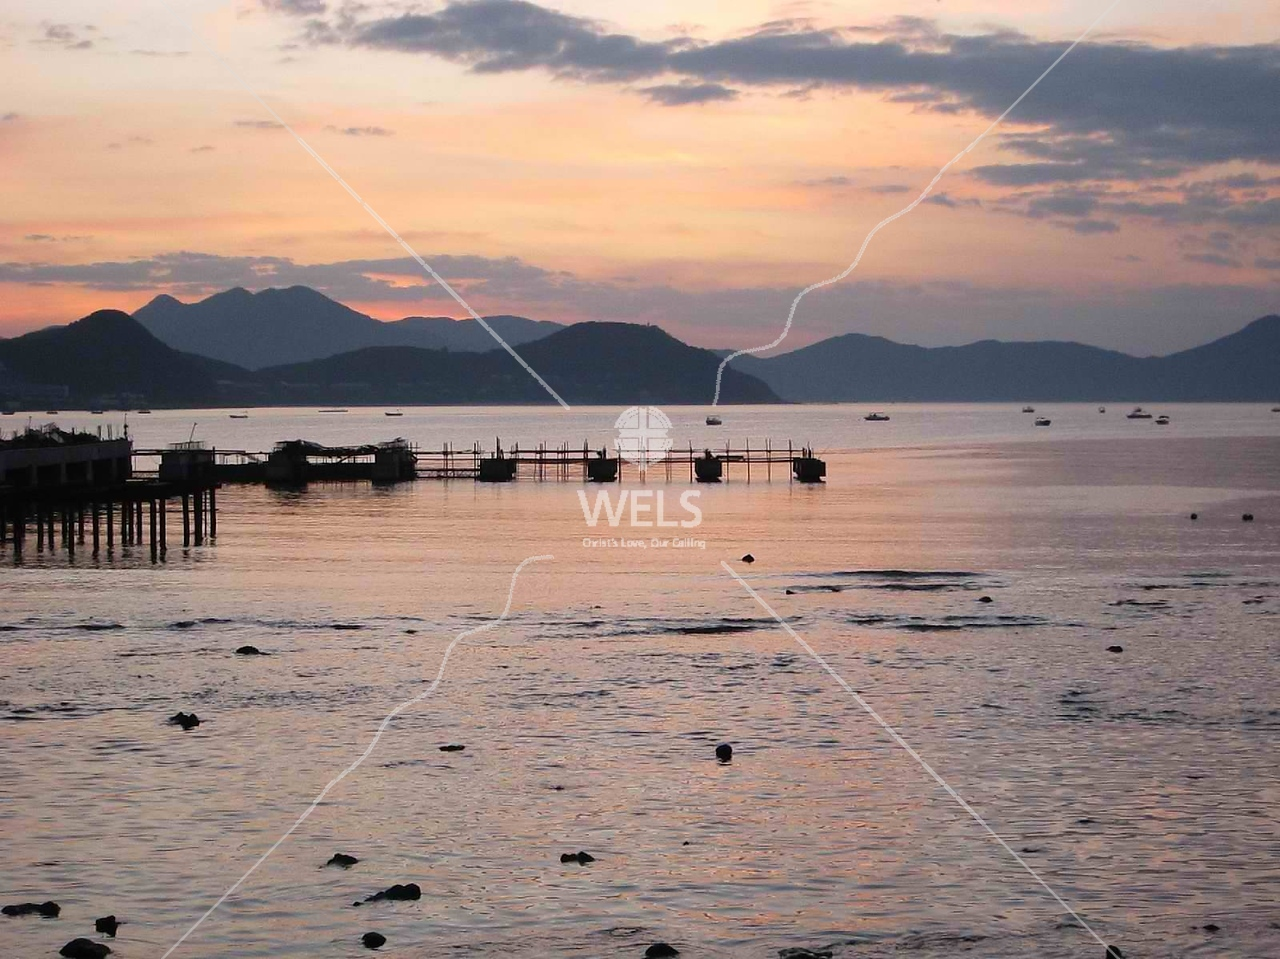 Calm Water at Sunrise, Sanya, Hainan China by kstellick